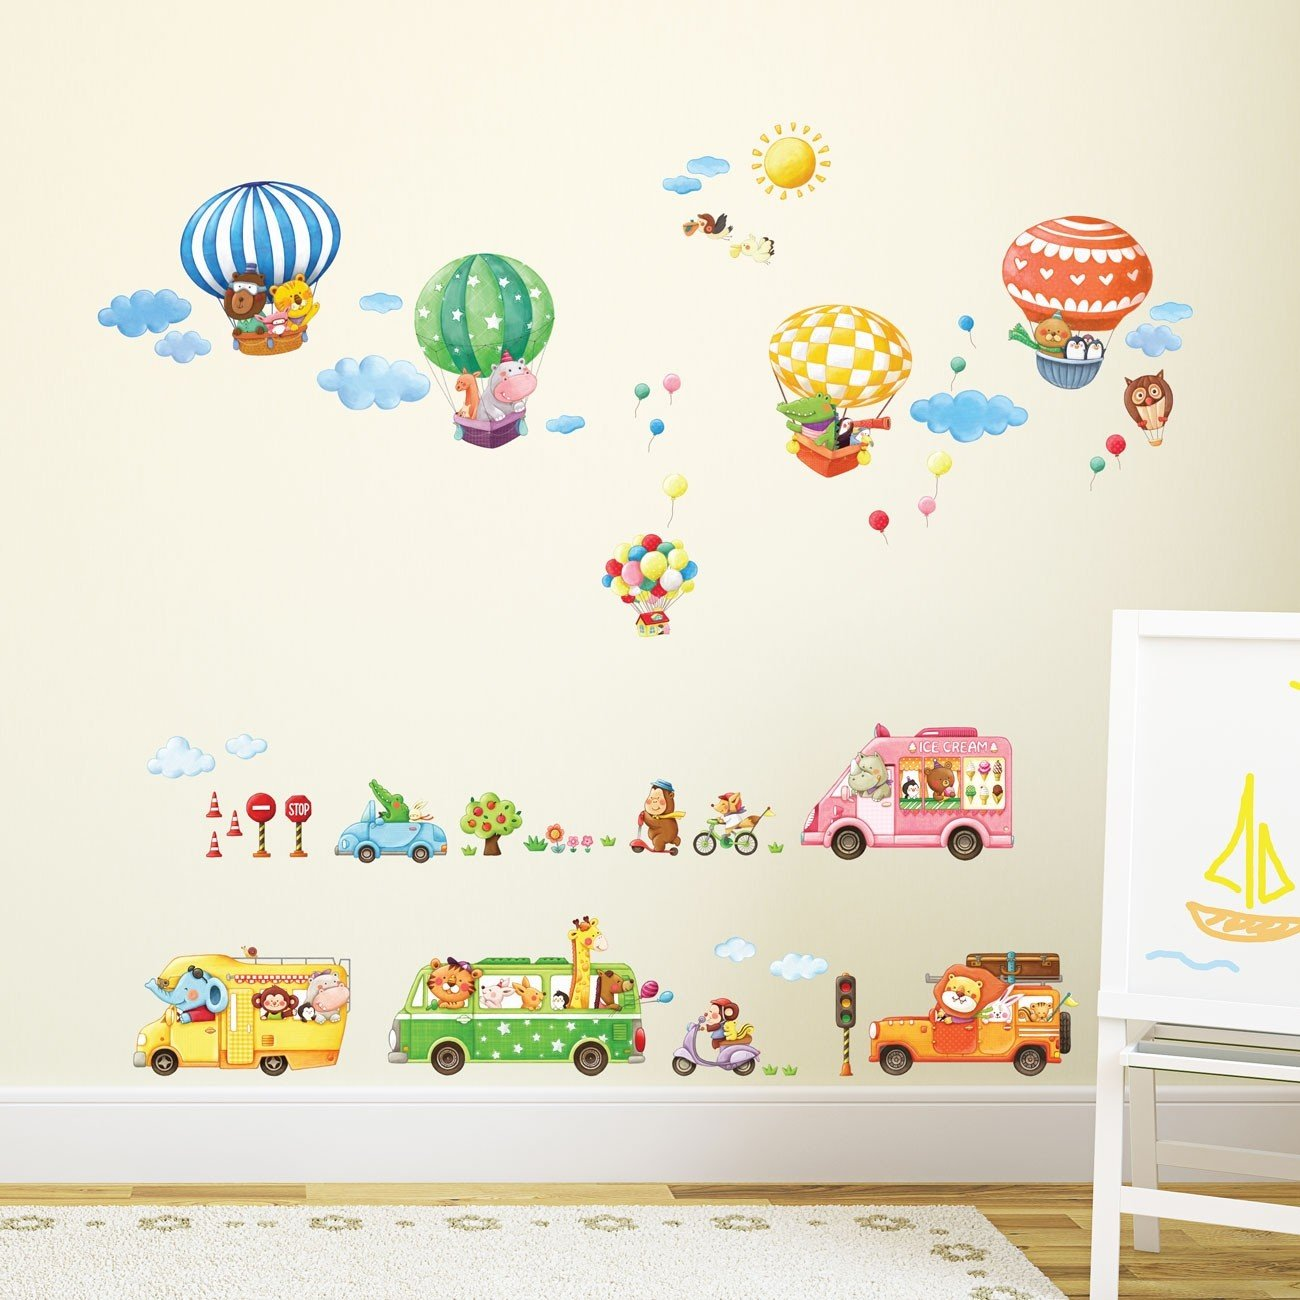 Decowall Da 1806p1406b Tiertransporte Und Hot Air Luftballons Kinder Wand Sticker Wand Aufkleber Schalen Und Stick